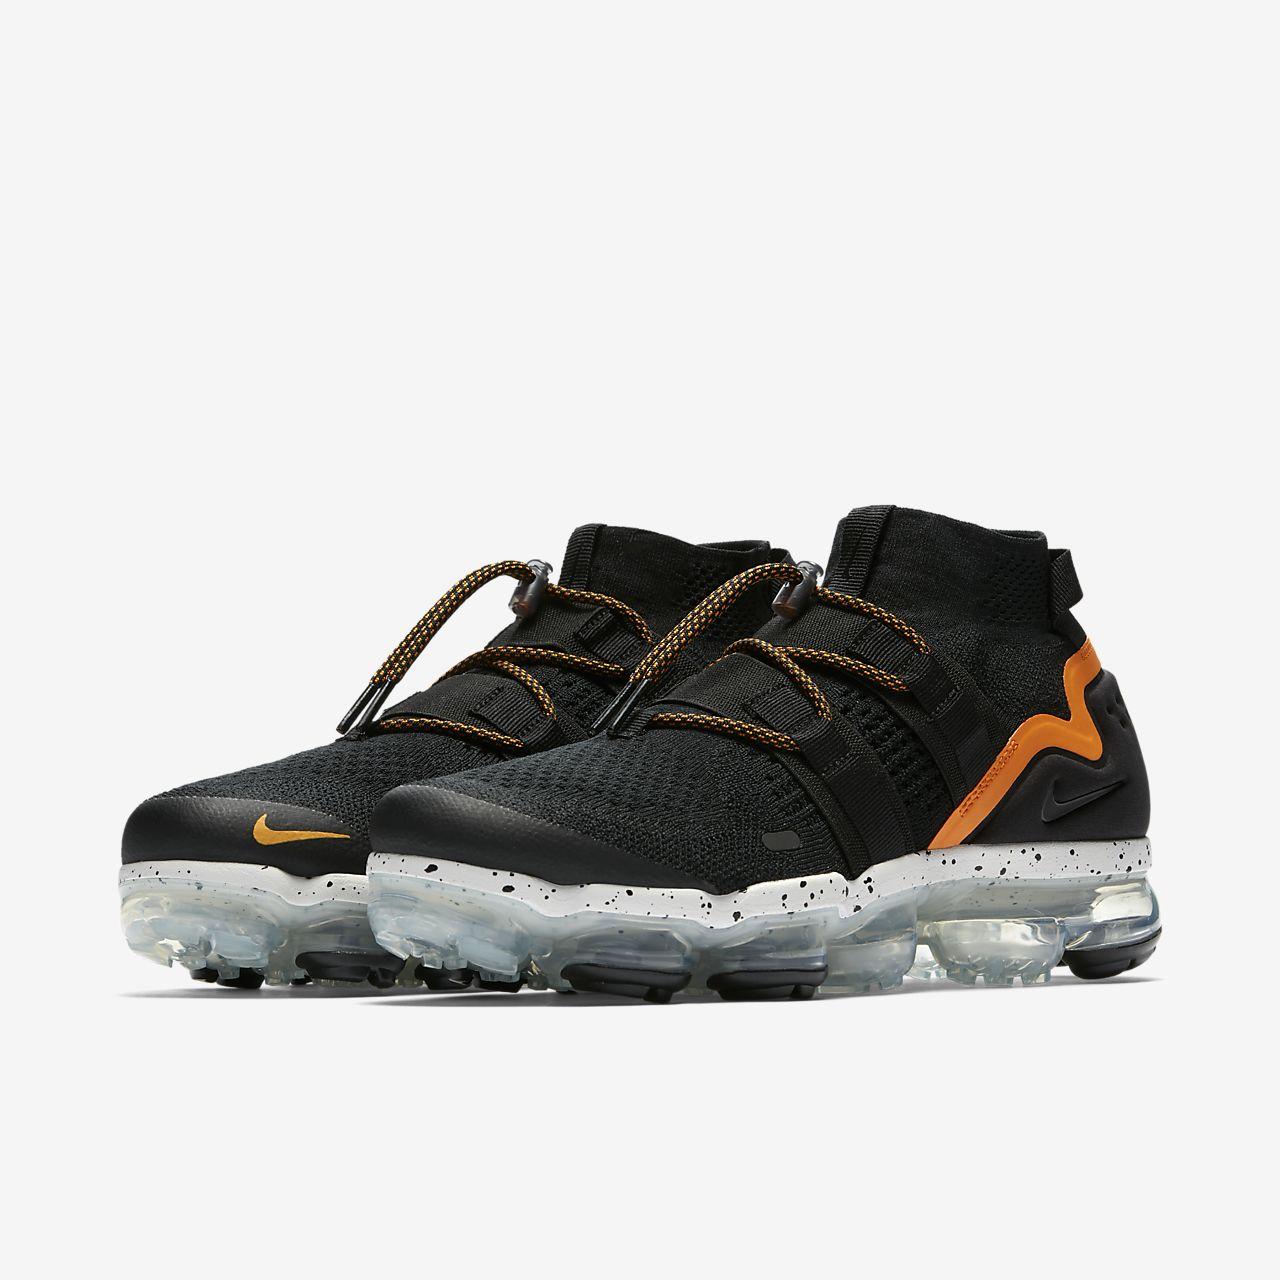 sale retailer 79448 0b76d Nike Air VaporMax Flyknit Utility Shoe